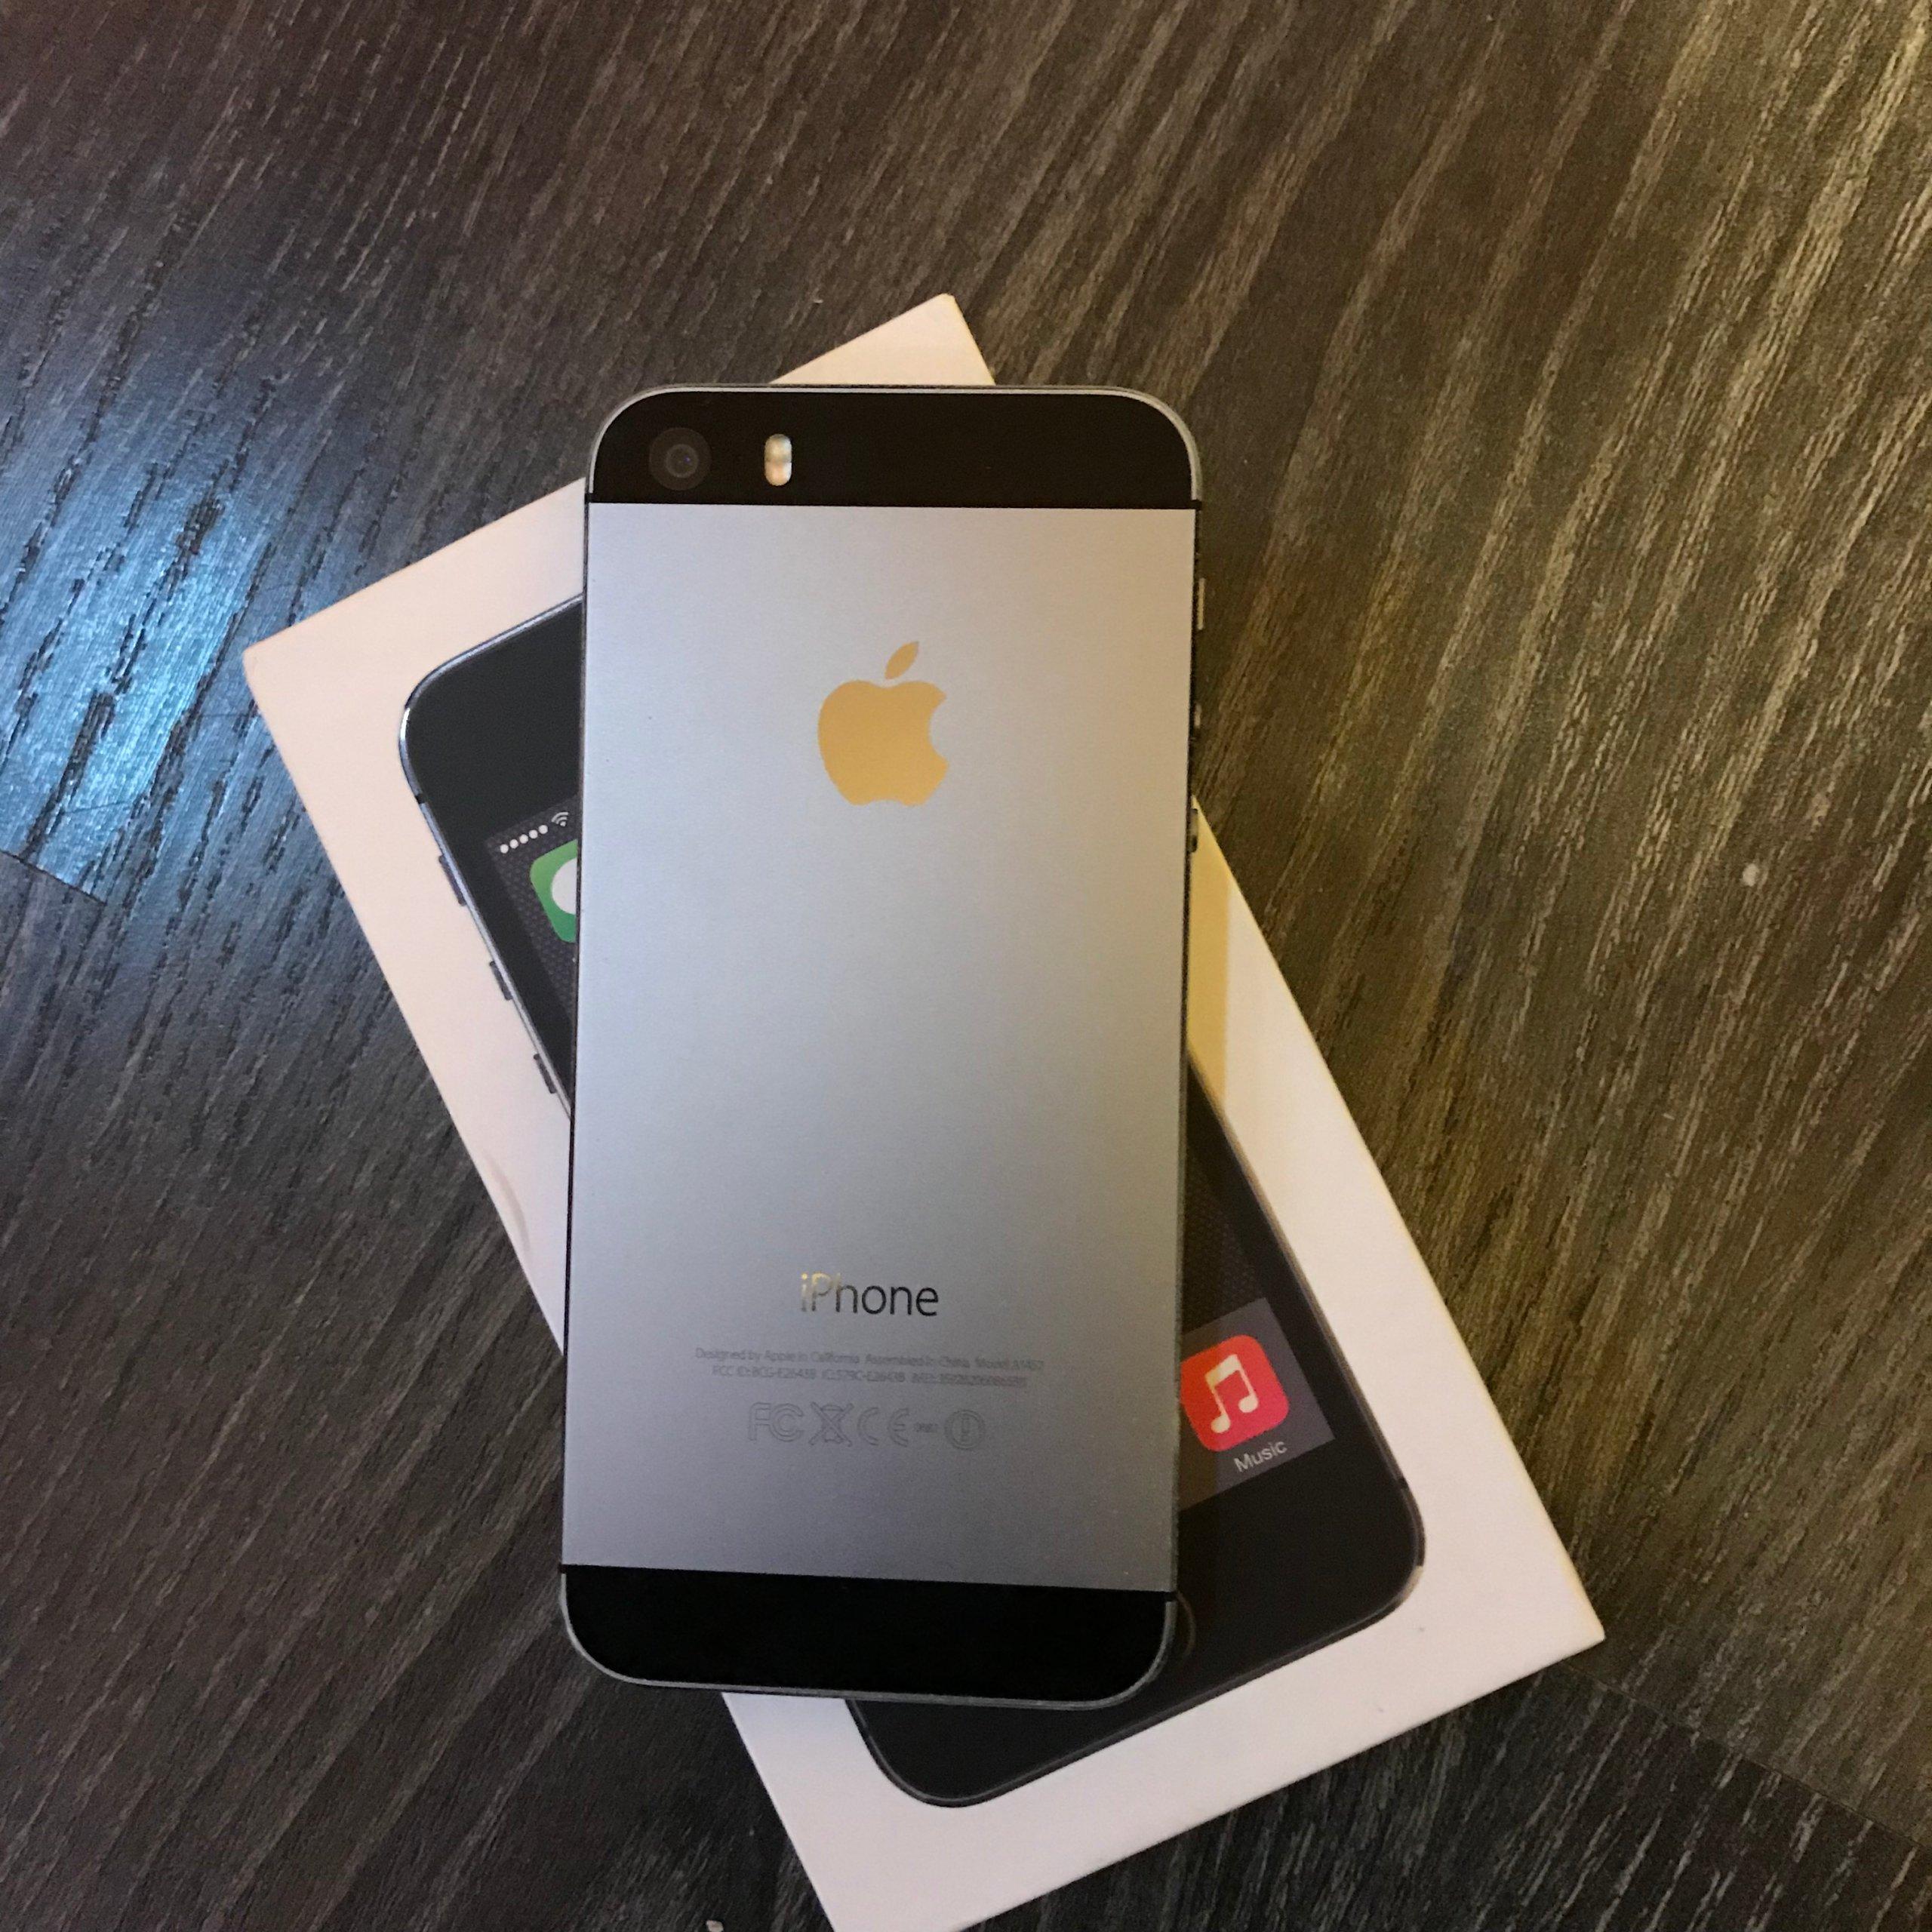 APPLE IPHONE 5S 16GB SPACE GREY